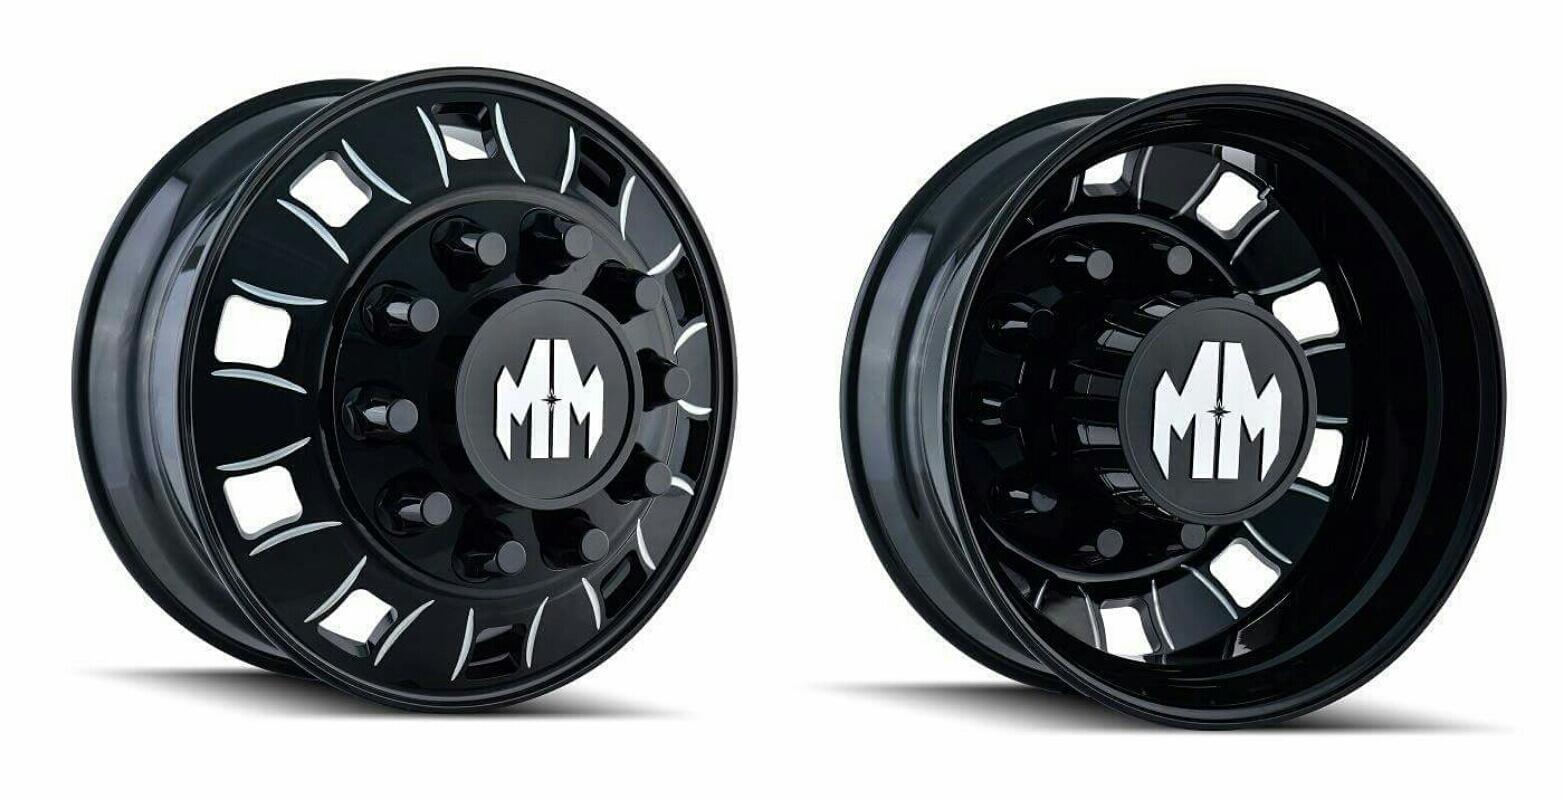 Mayhem BIG RIG Semi Dually Wheels Rims Peterbilt International Freightliner Mack Chevy Chevrolet Dodge Ford Trucks